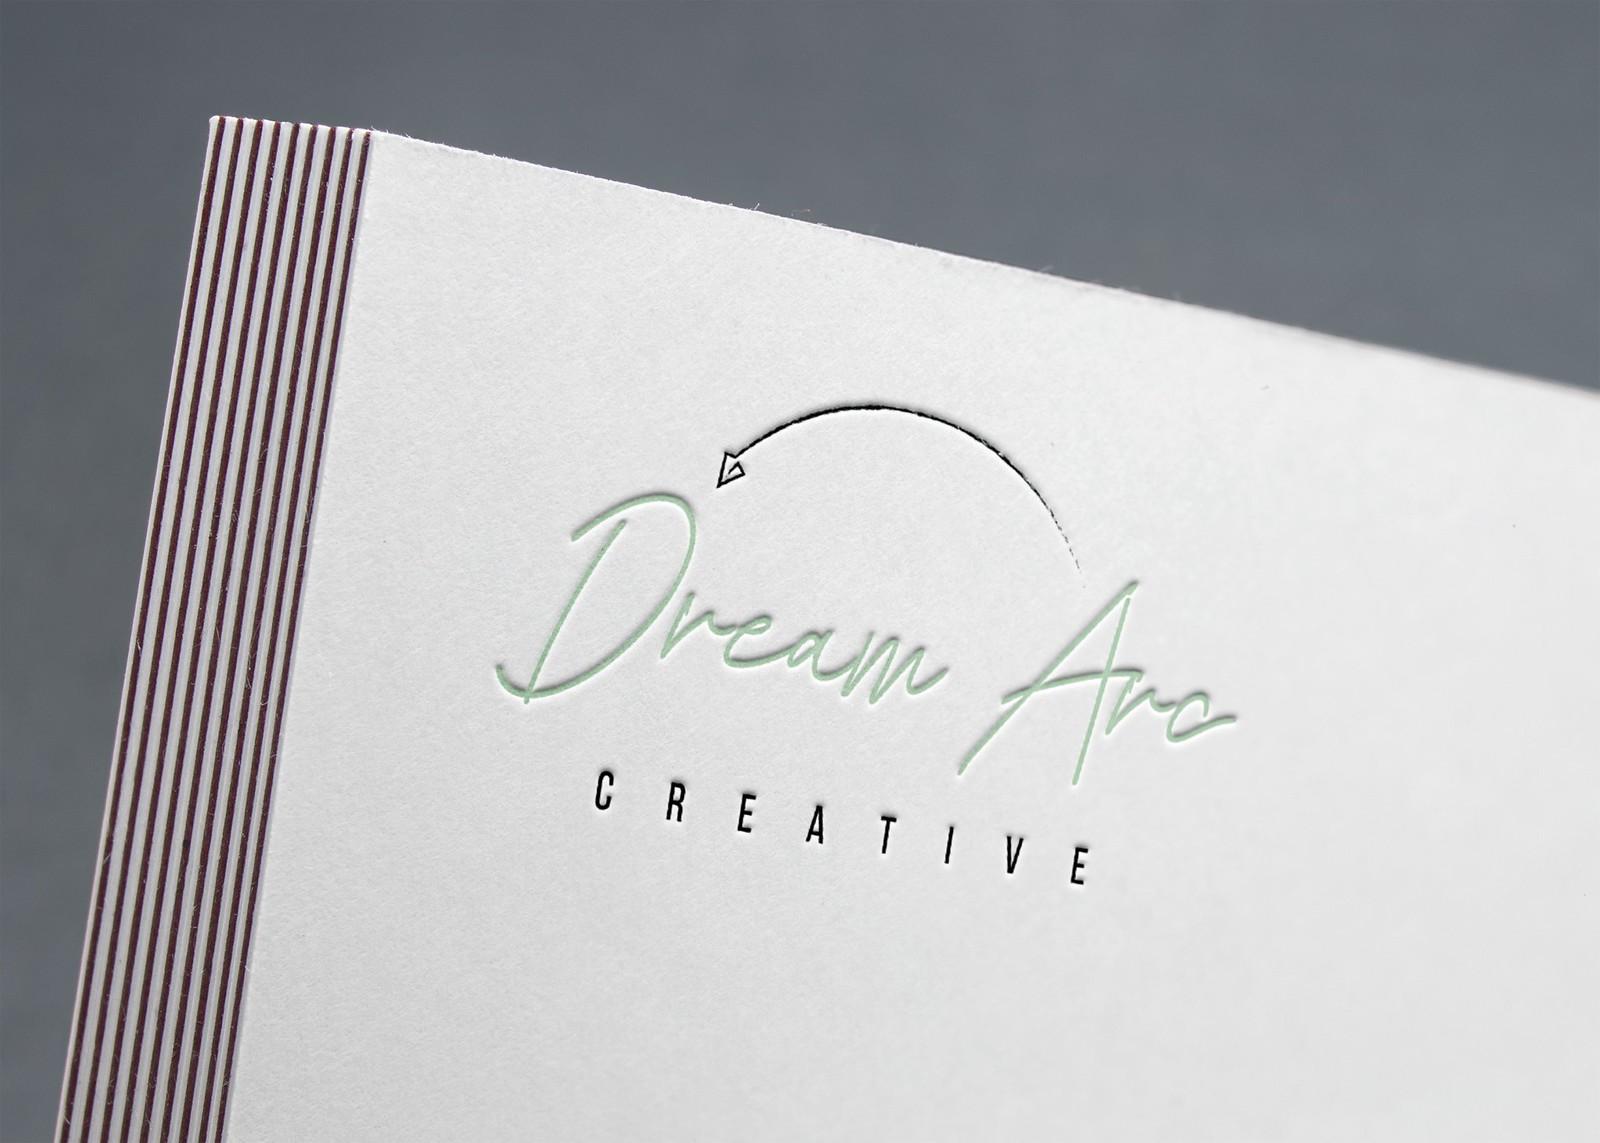 Dream Arc Creative DAC Tuyen Chau Creative Director Co-founder